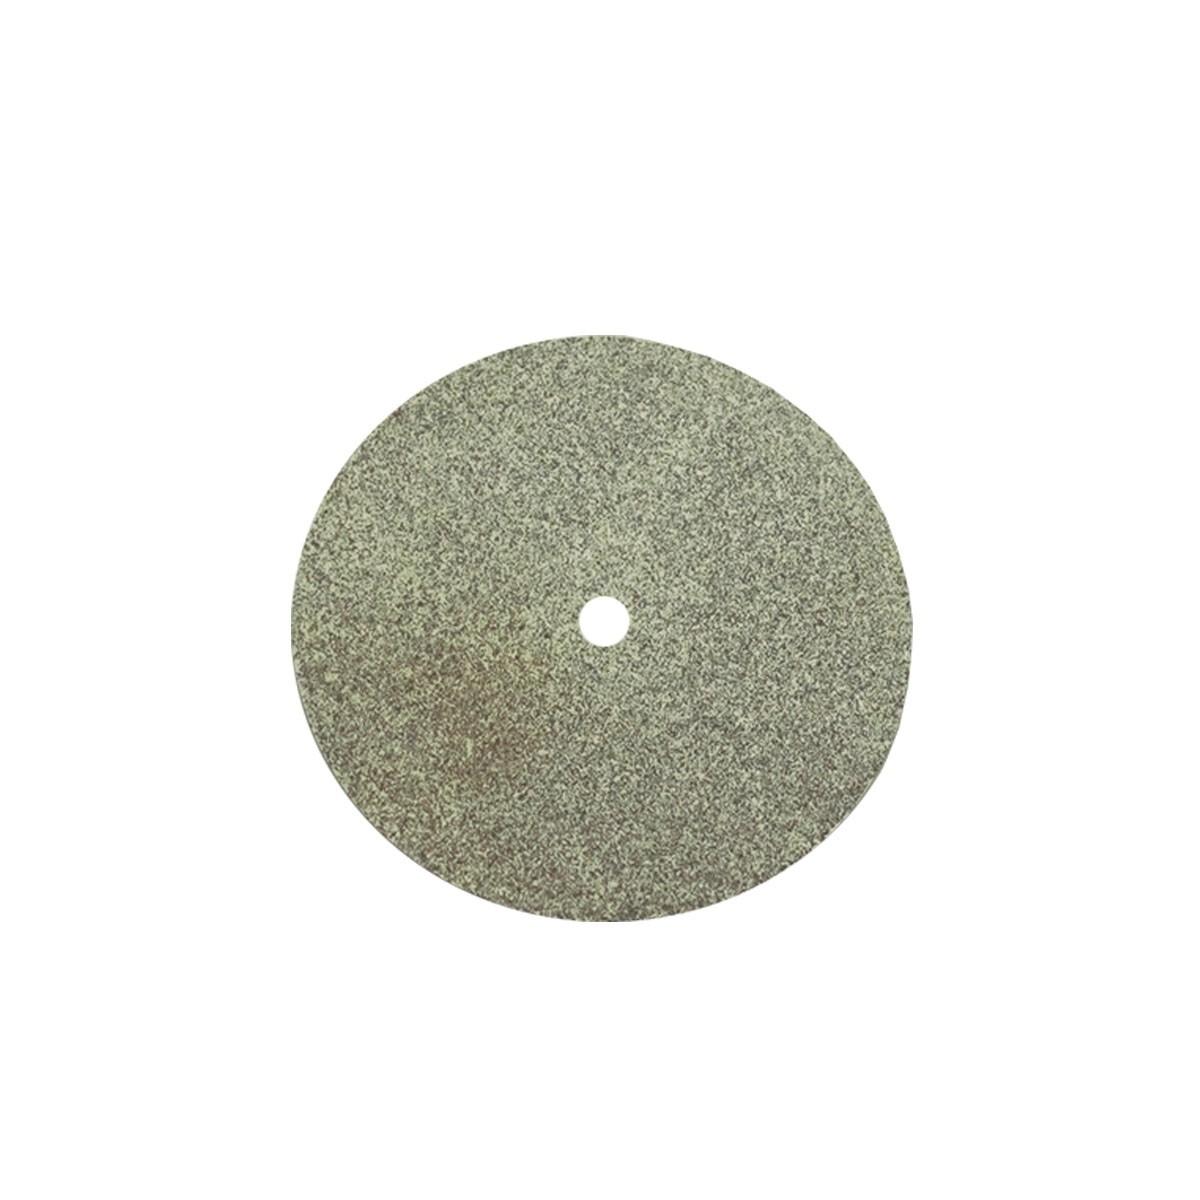 Disco Diamantado Dupla Face Total KG Sorensen s/ Mandril - Ref 7020